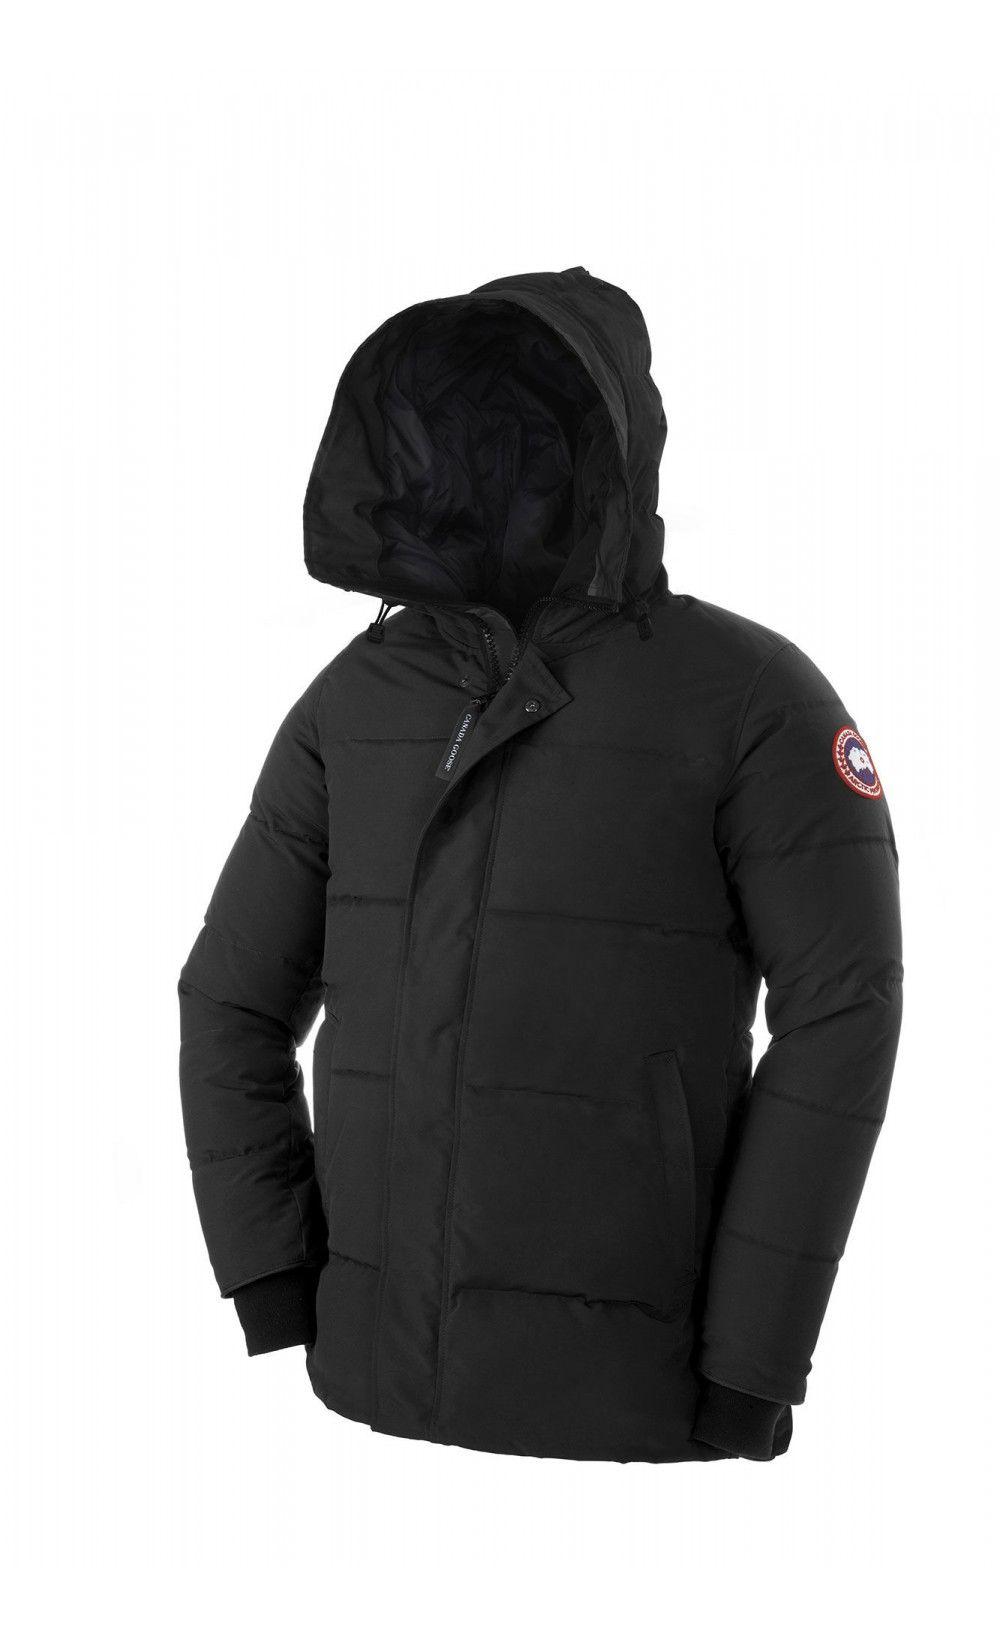 Canada Goose Macmillan Parka Black Men - Canada Goose  canadagoose  parka   jackets  fashion  men  christmas  gift  lifestyle  winterfashion c2f7d96bef